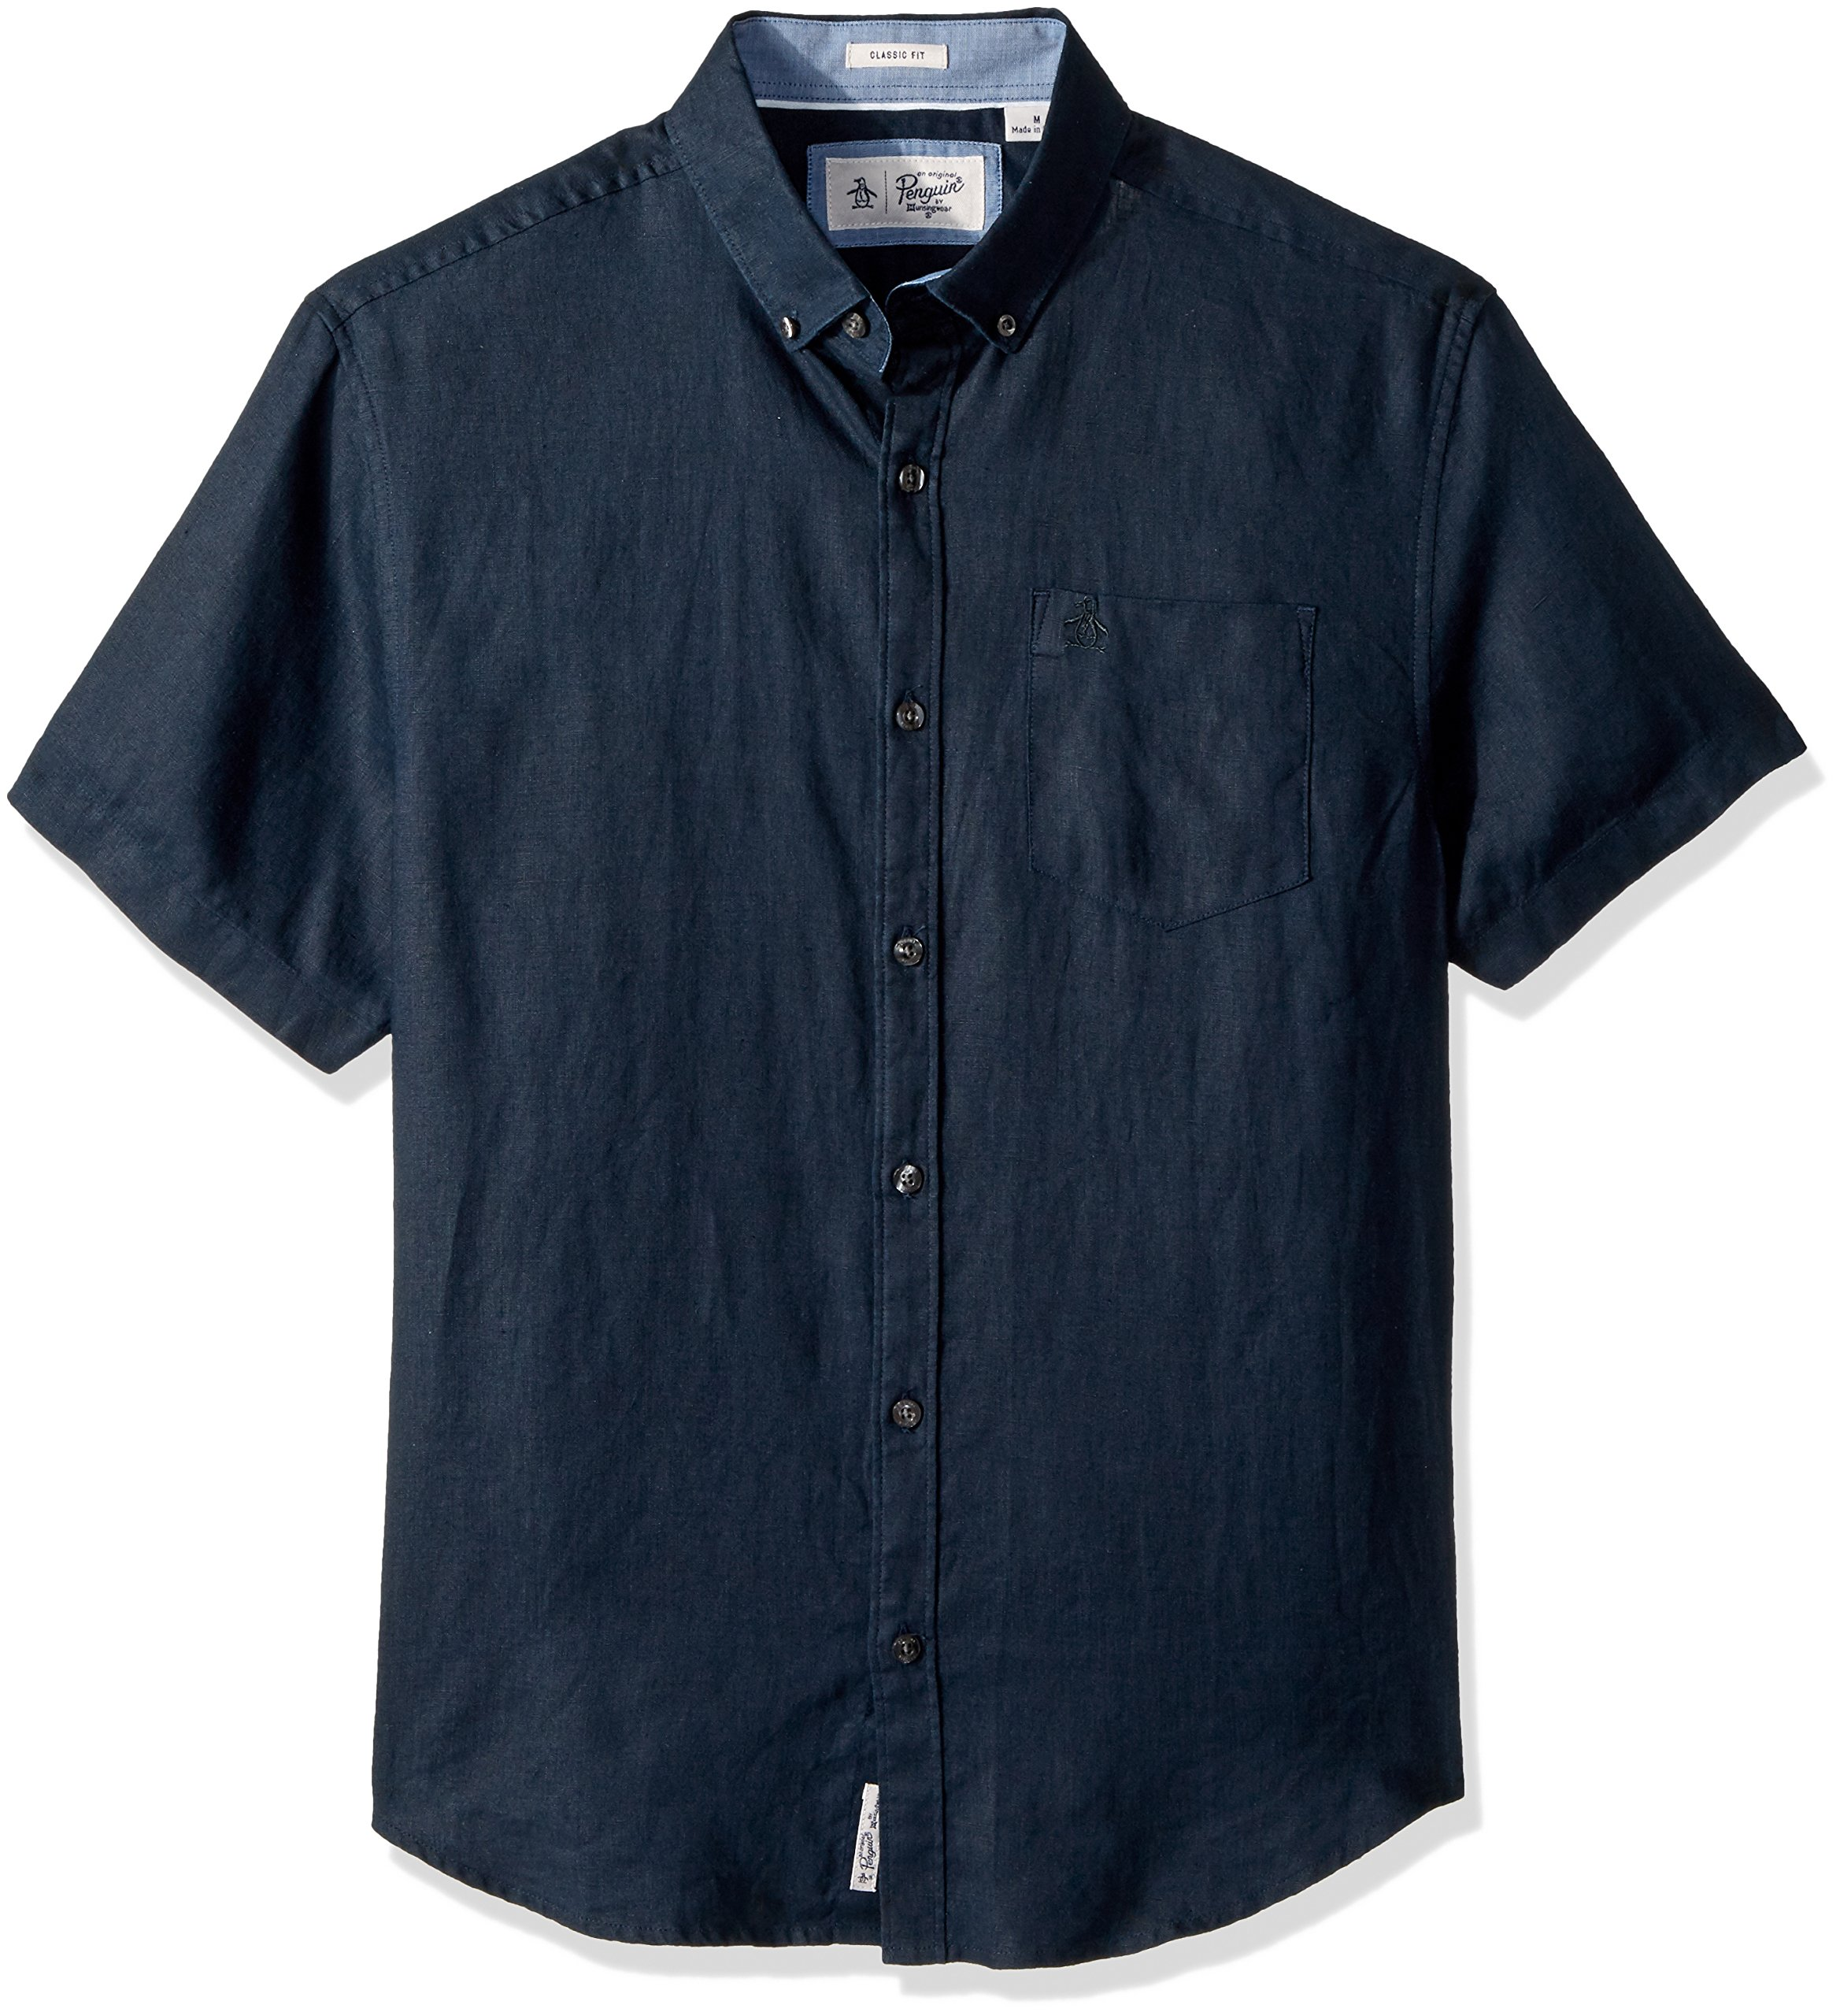 Original Penguin Men's Short Sleeve Washed Linen Shirt, Dark Sapphire, Extra Large